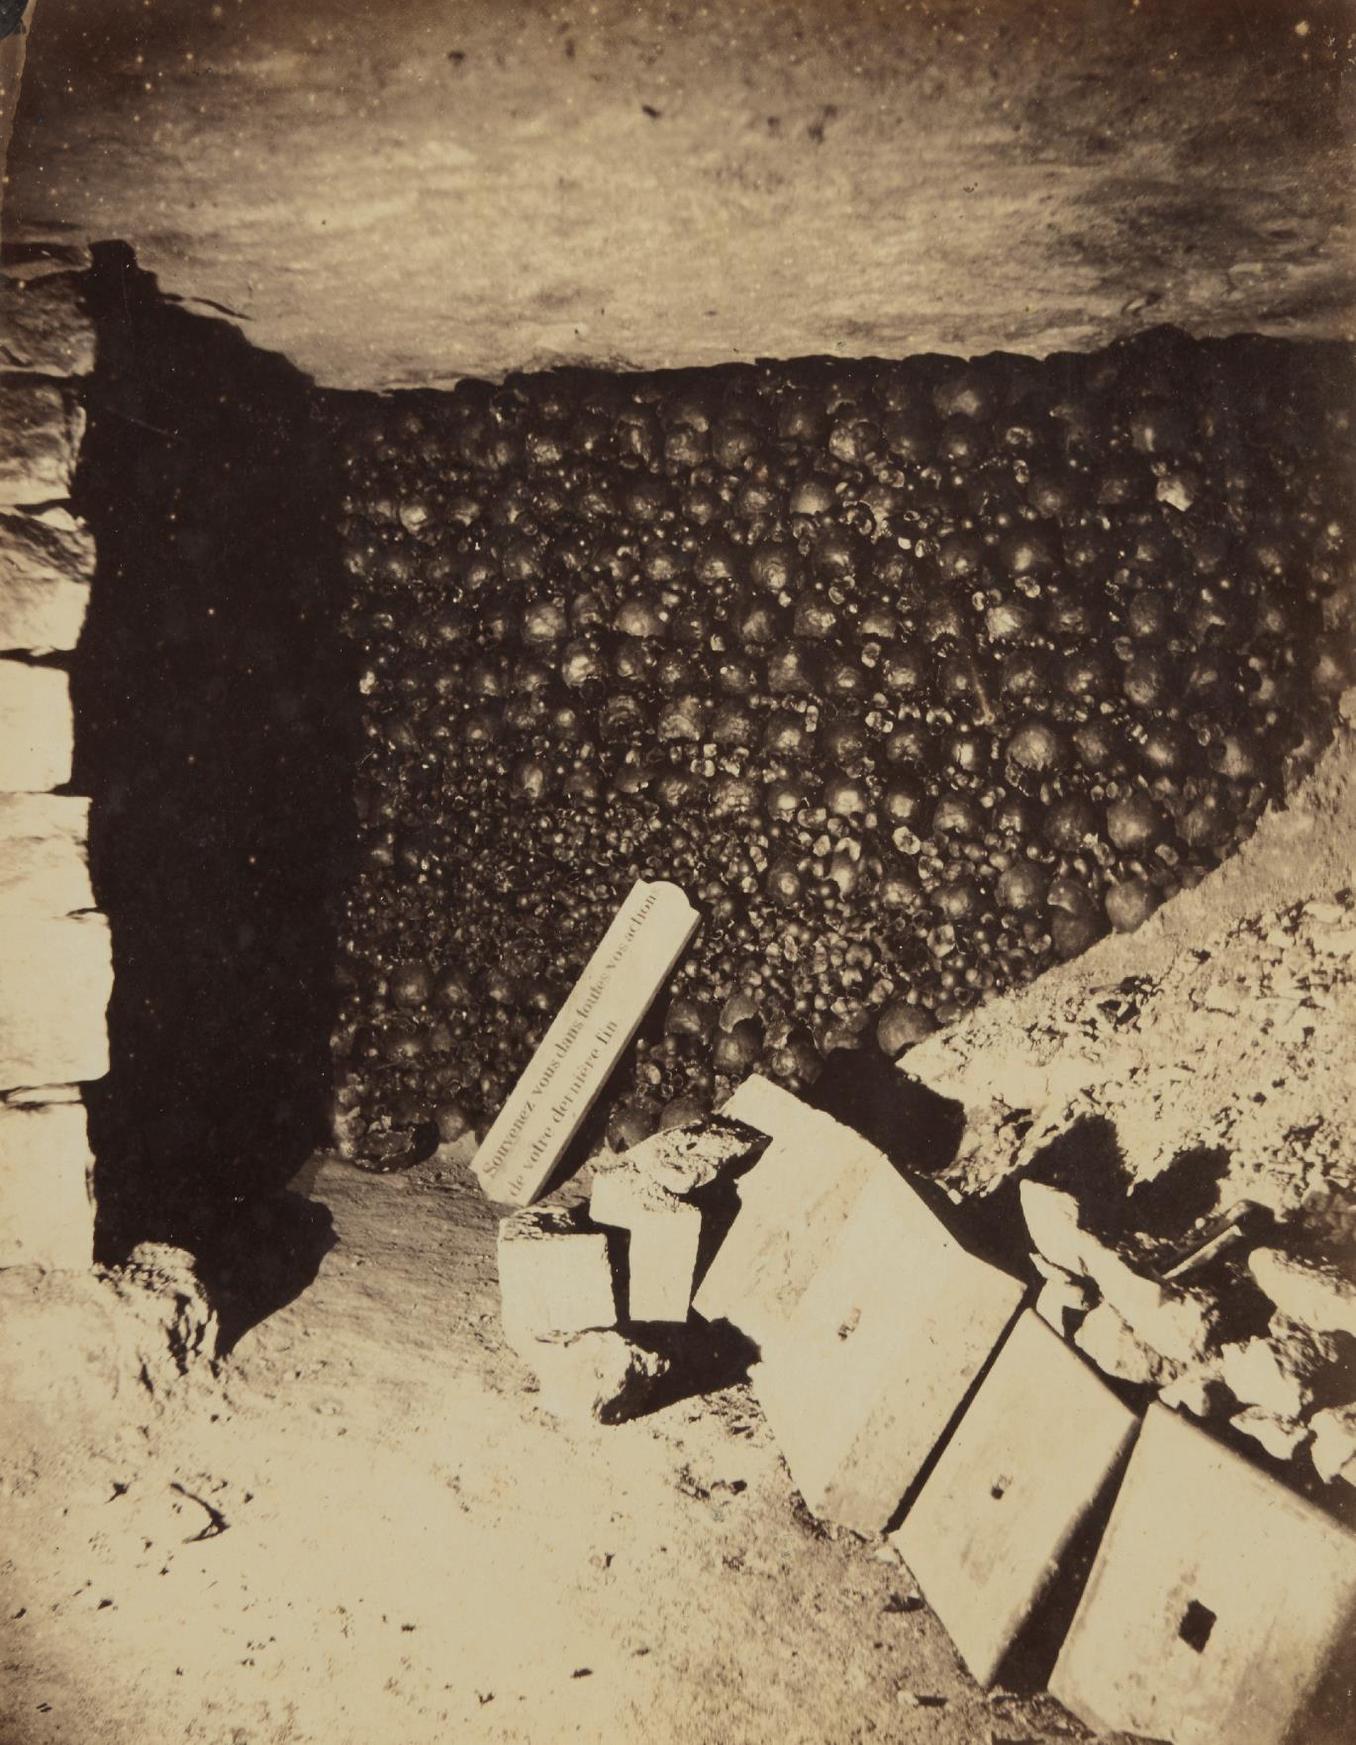 Nadar-Catacombs, Paris, April-1862